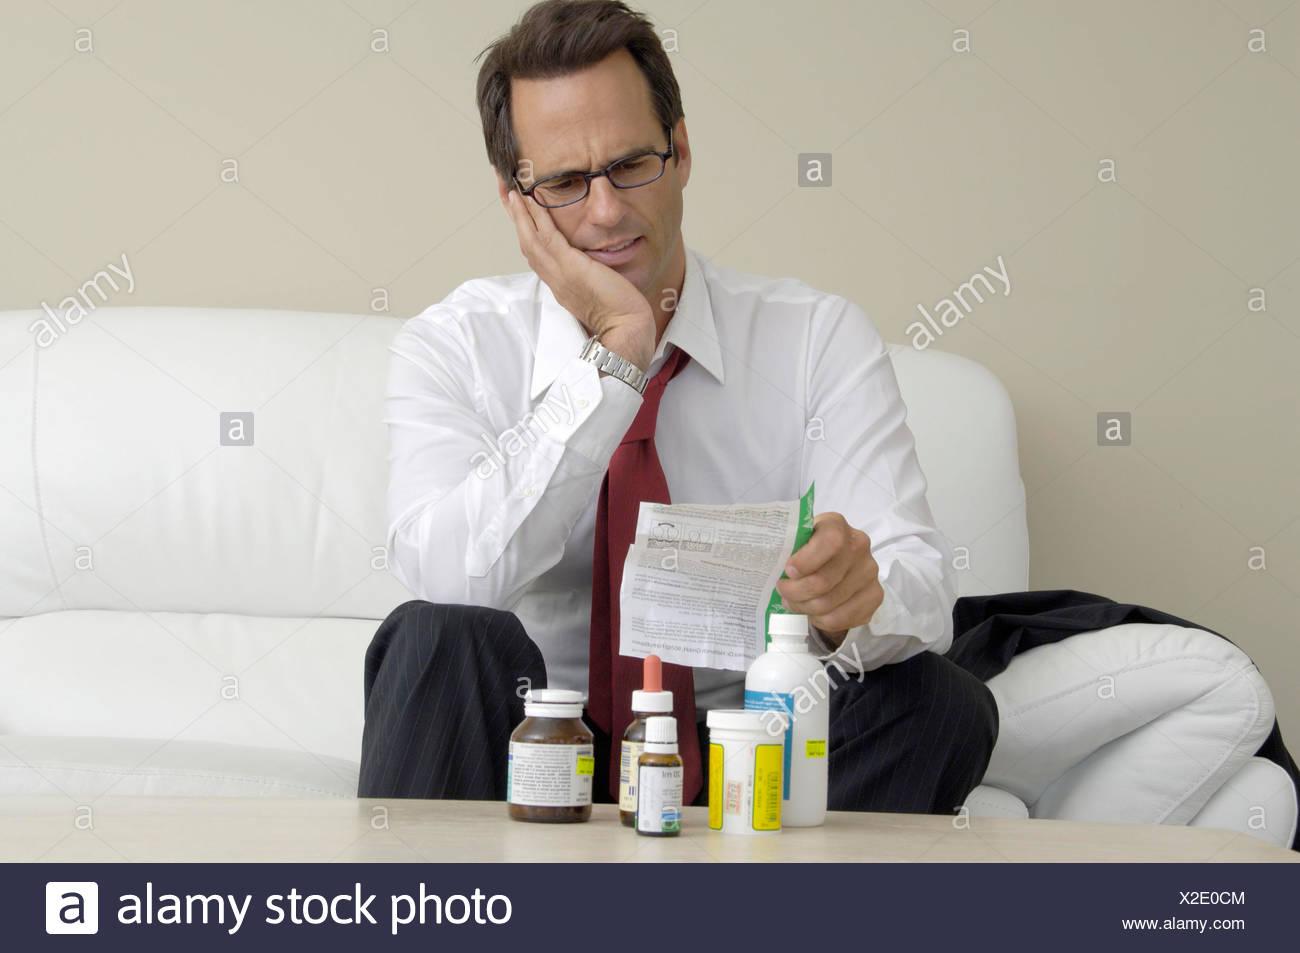 Man inside sitting sofa reading packing addition slip of paper medicines medicine medicament - Stock Image